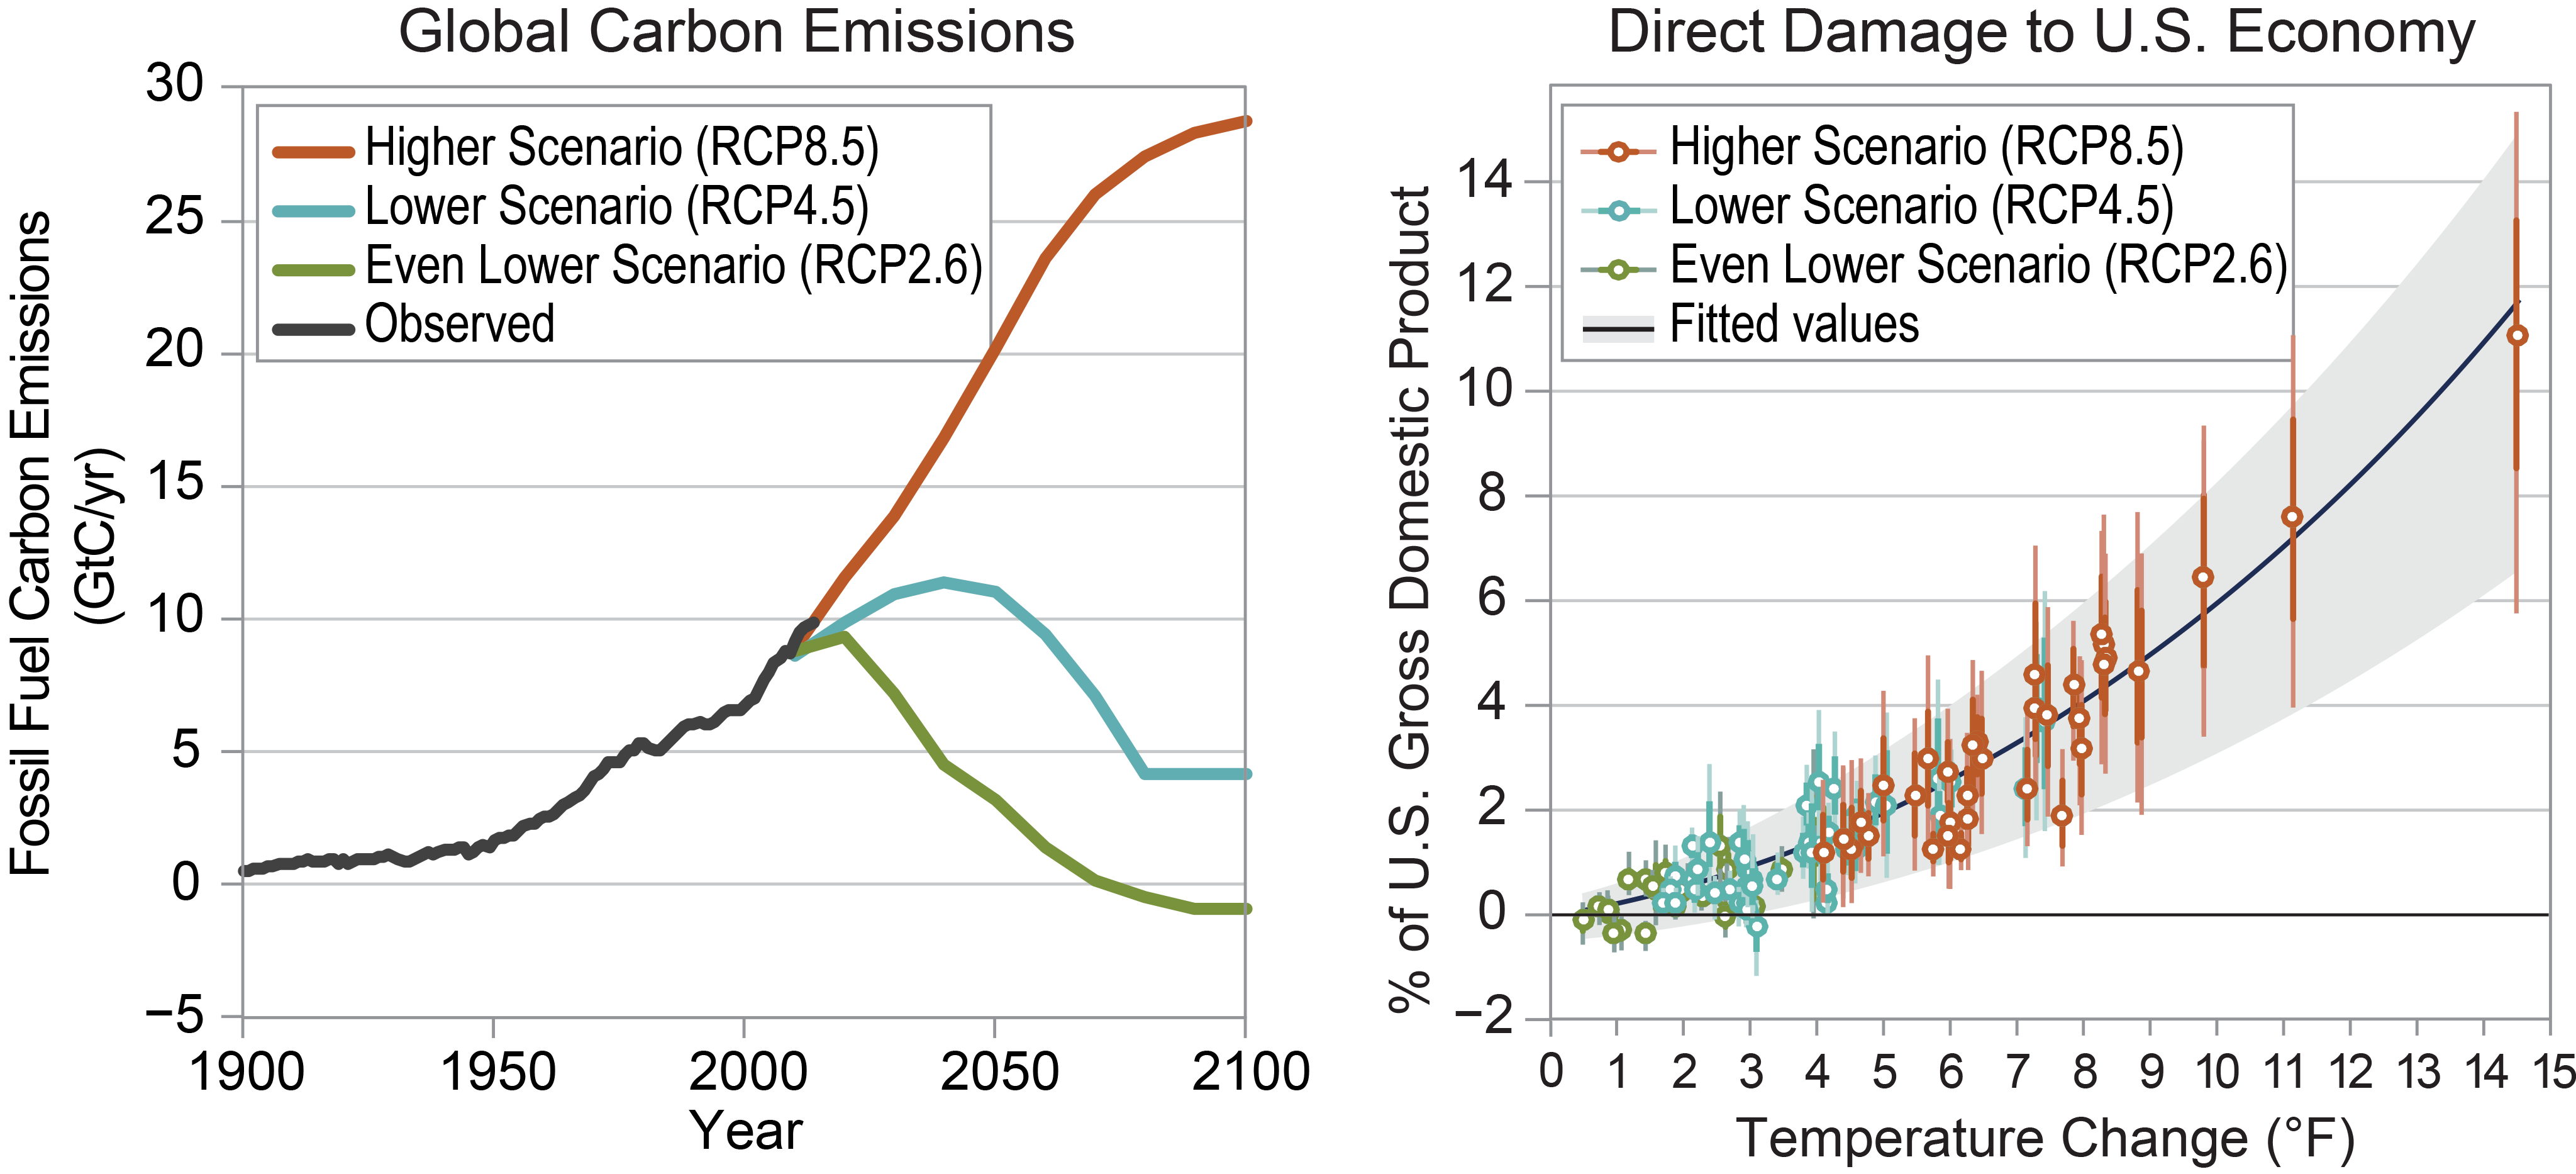 Reducing Risks Through Emissions Mitigation - Fourth